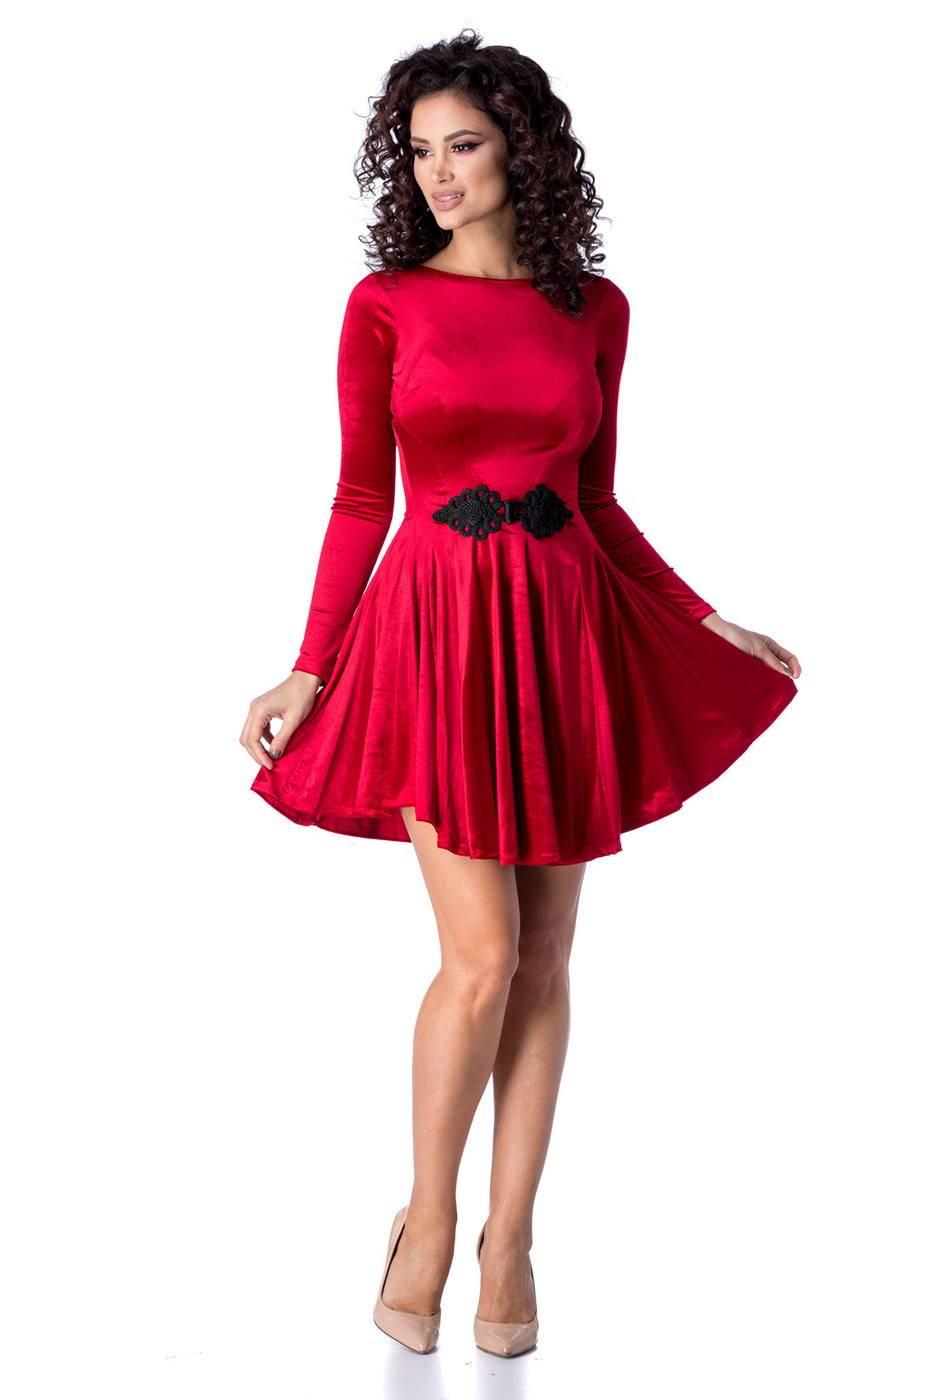 Mirrey Κόκκινο Φόρεμα 4530